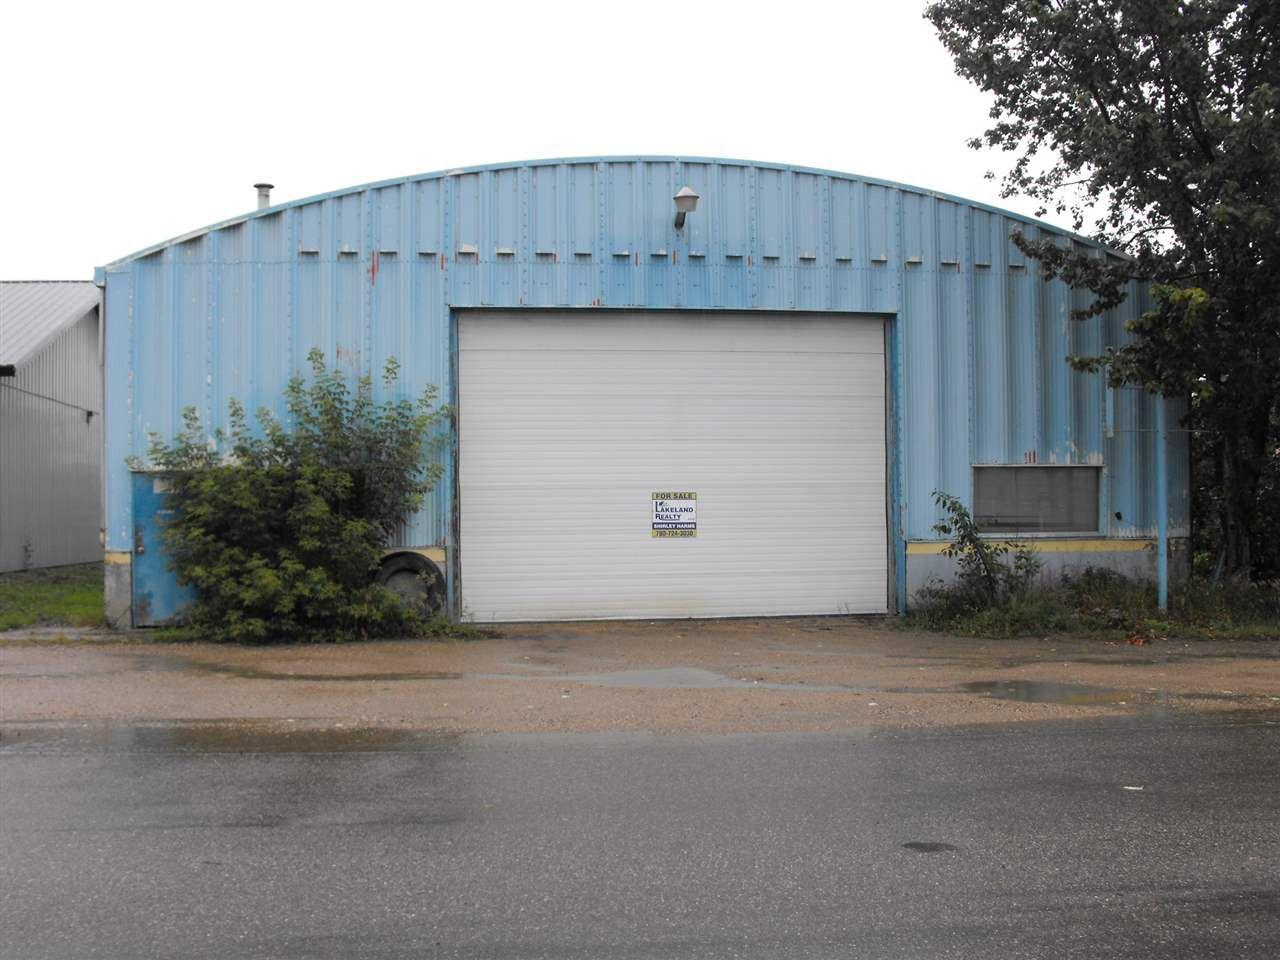 Main Photo: 4914 Railway Avenue: Elk Point Industrial for sale : MLS®# E4146691